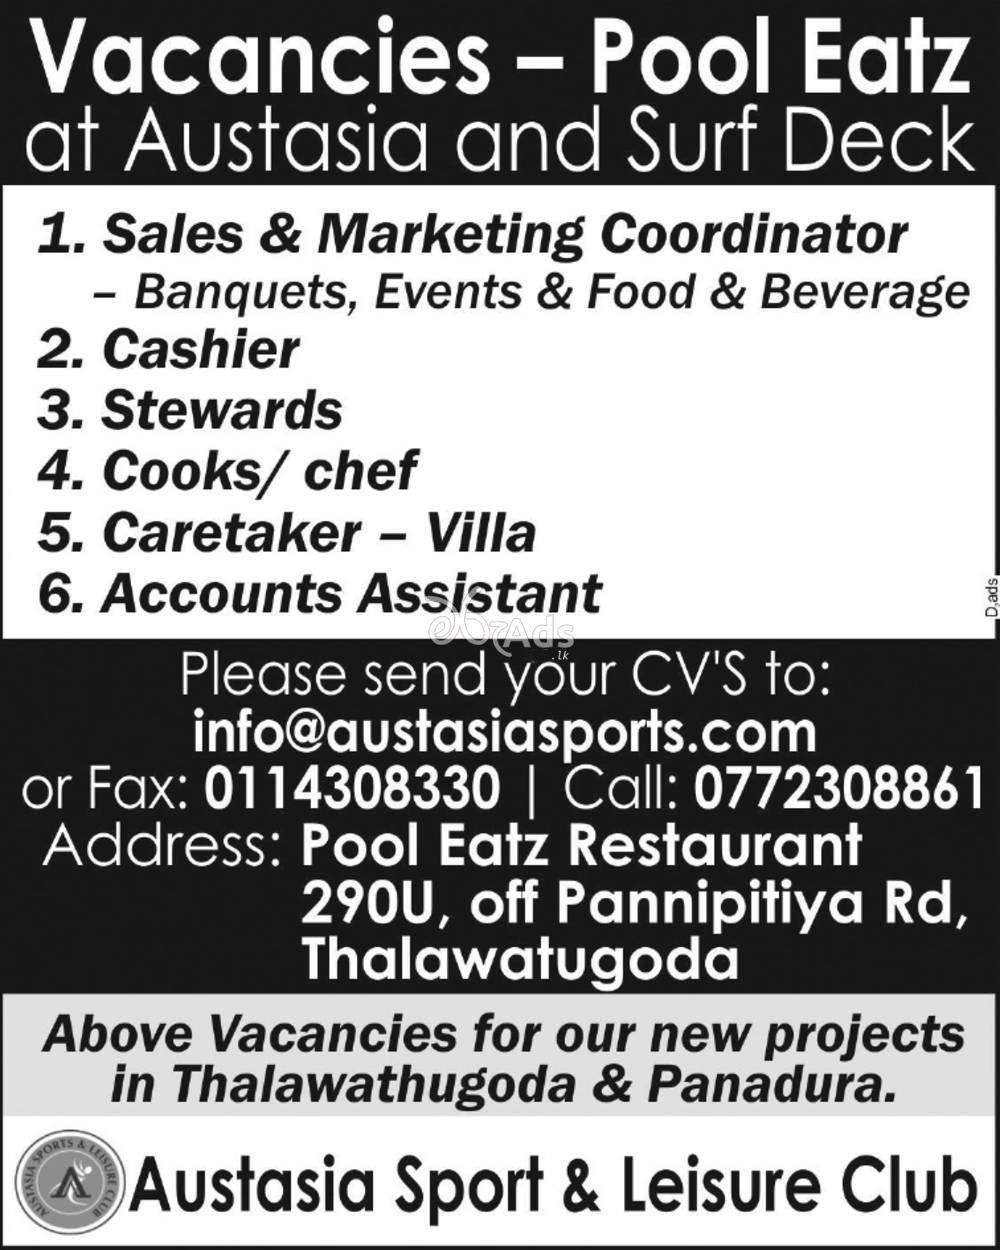 Sales & Marketing Coordinator, Cashier, Stewards, Cooks/ Chef, Caretaker, Accounts Assistant